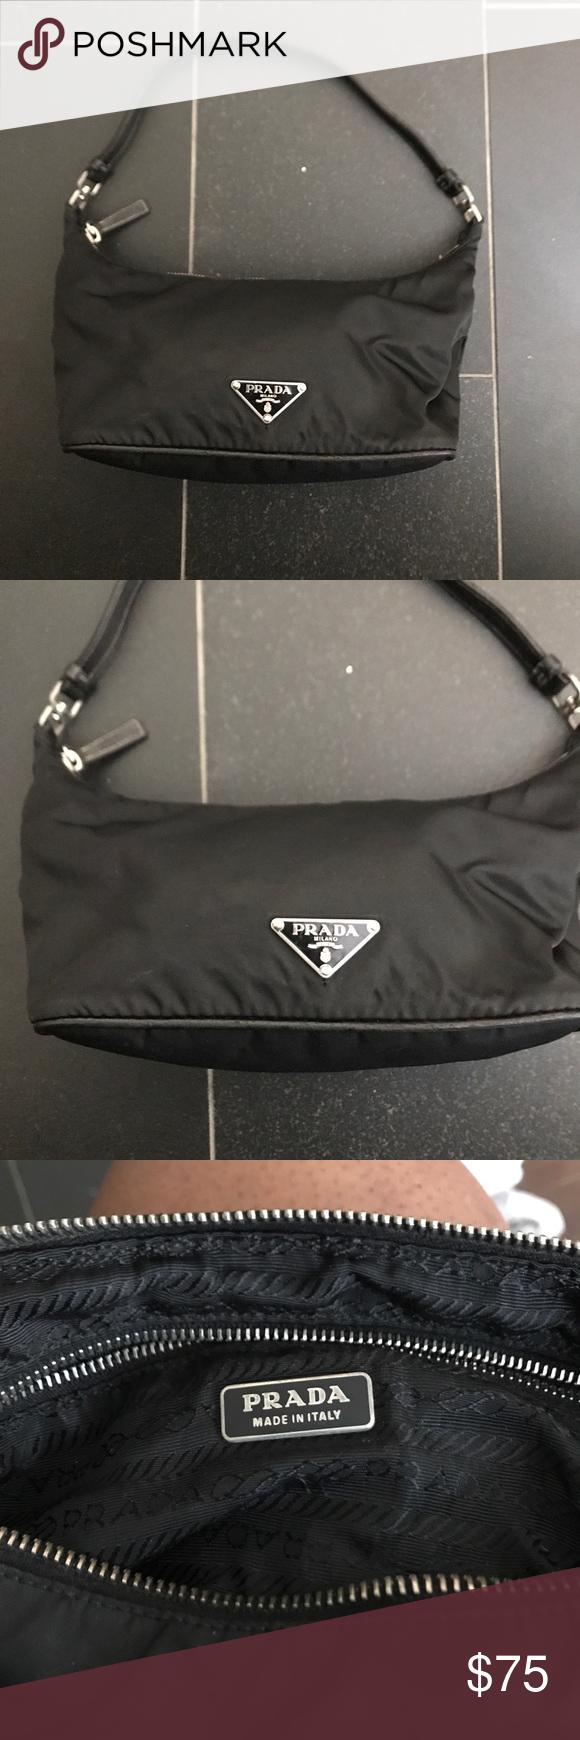 57ecdedb4aa192 PRADA Mini Hobo Bag Great condition PRADA Tessuto black nylon mini Hobo bag  with leather trim